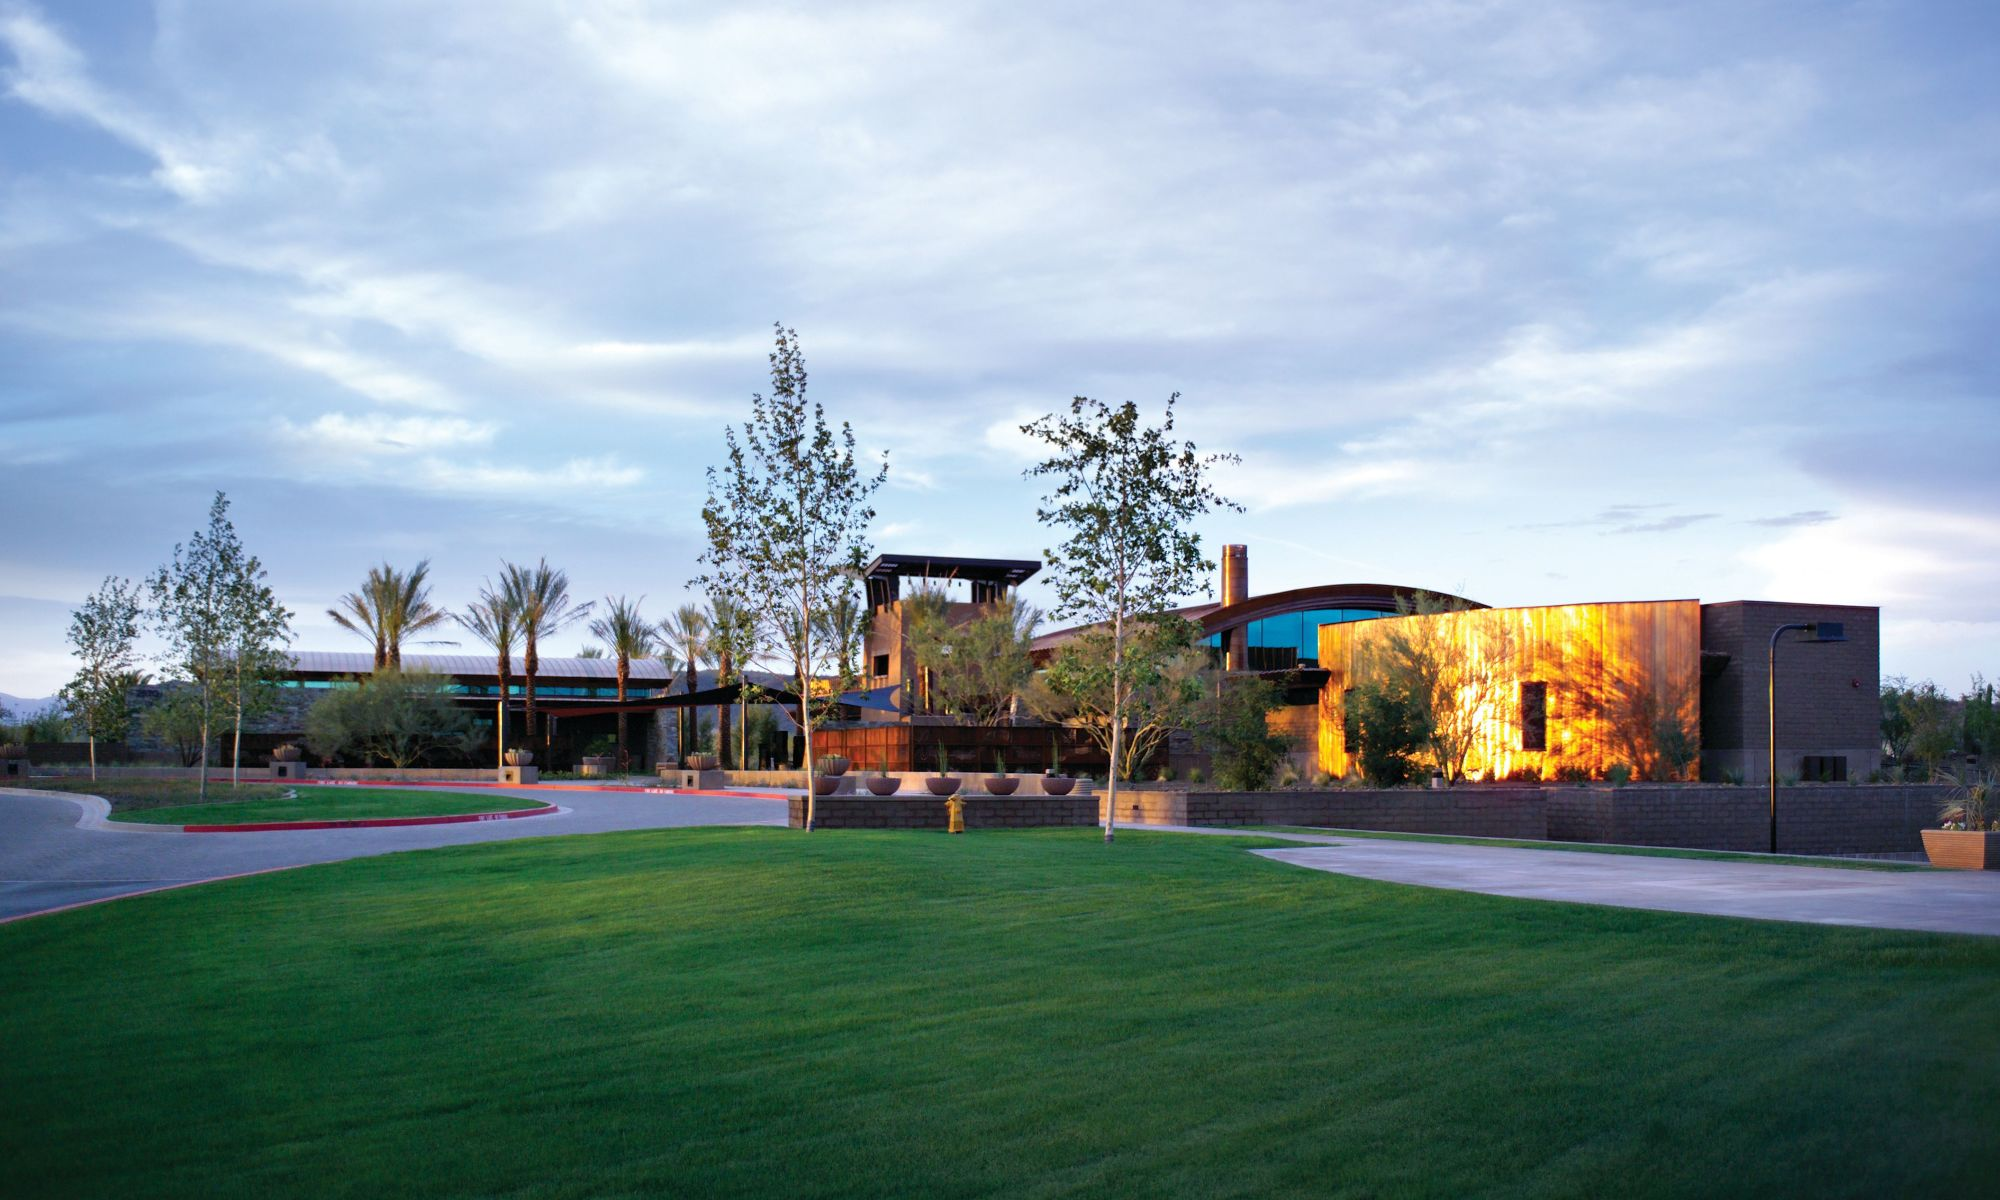 BB Living at Vistancia Townhomes in Peoria, Arizona